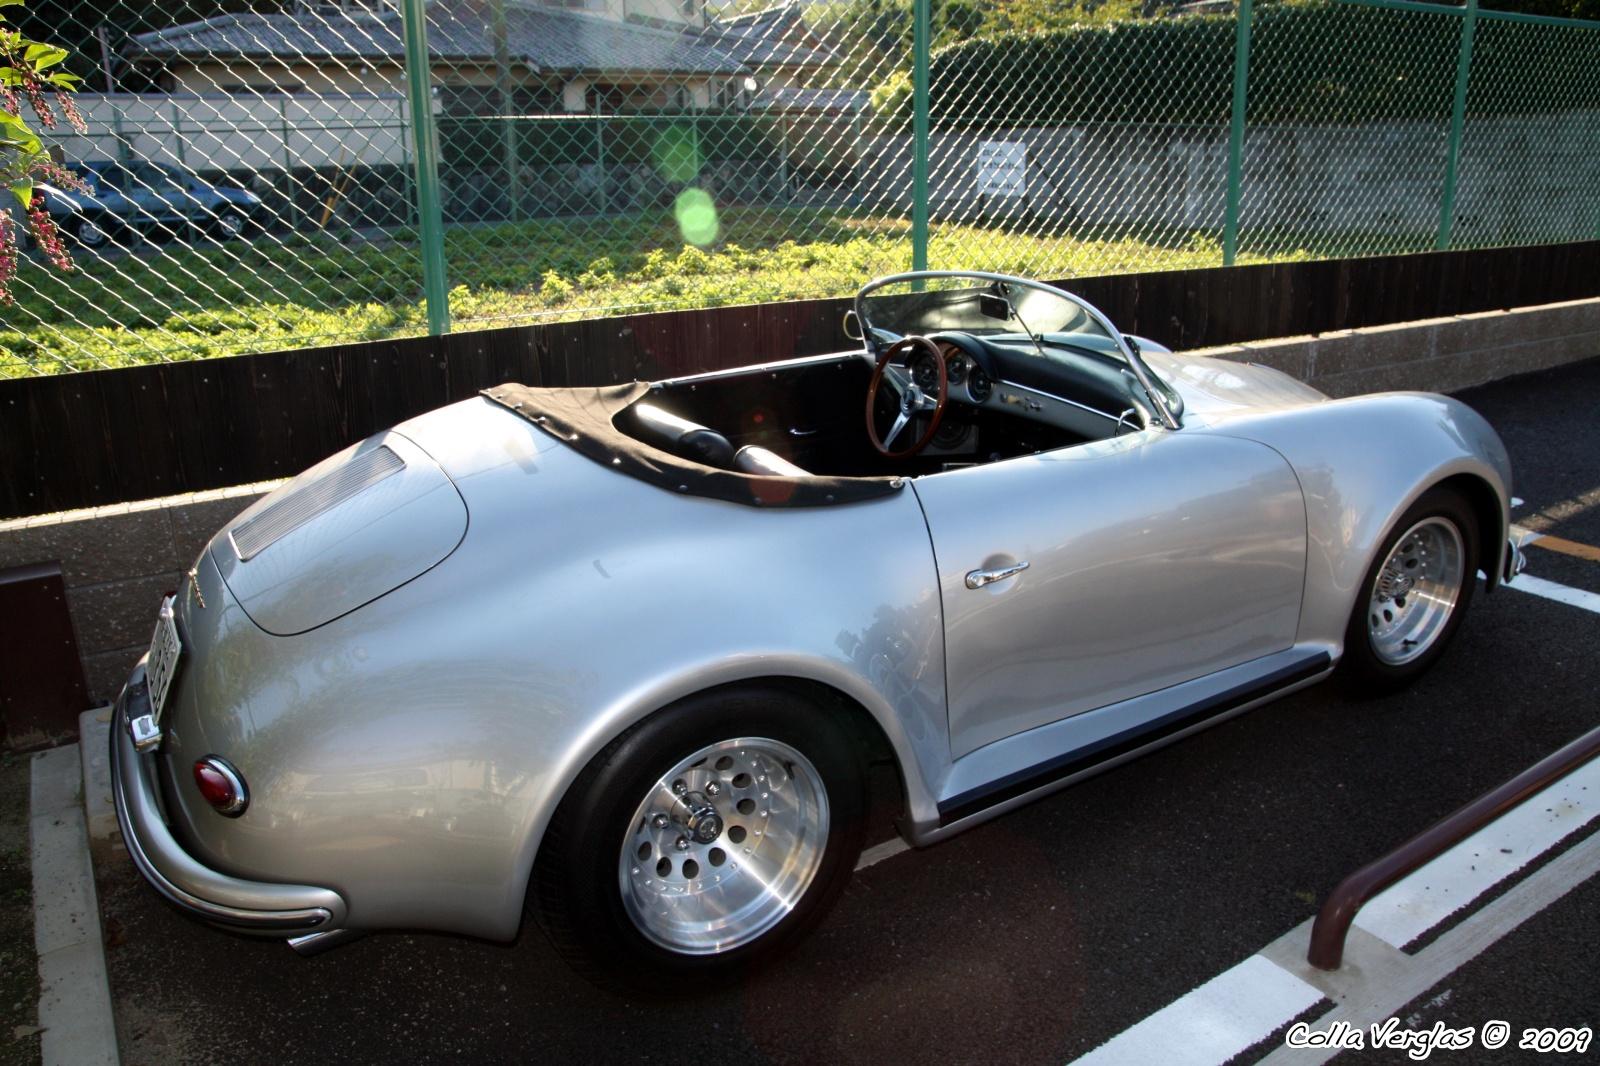 porsche 356 speedster replica picture 13 reviews news specs buy car. Black Bedroom Furniture Sets. Home Design Ideas